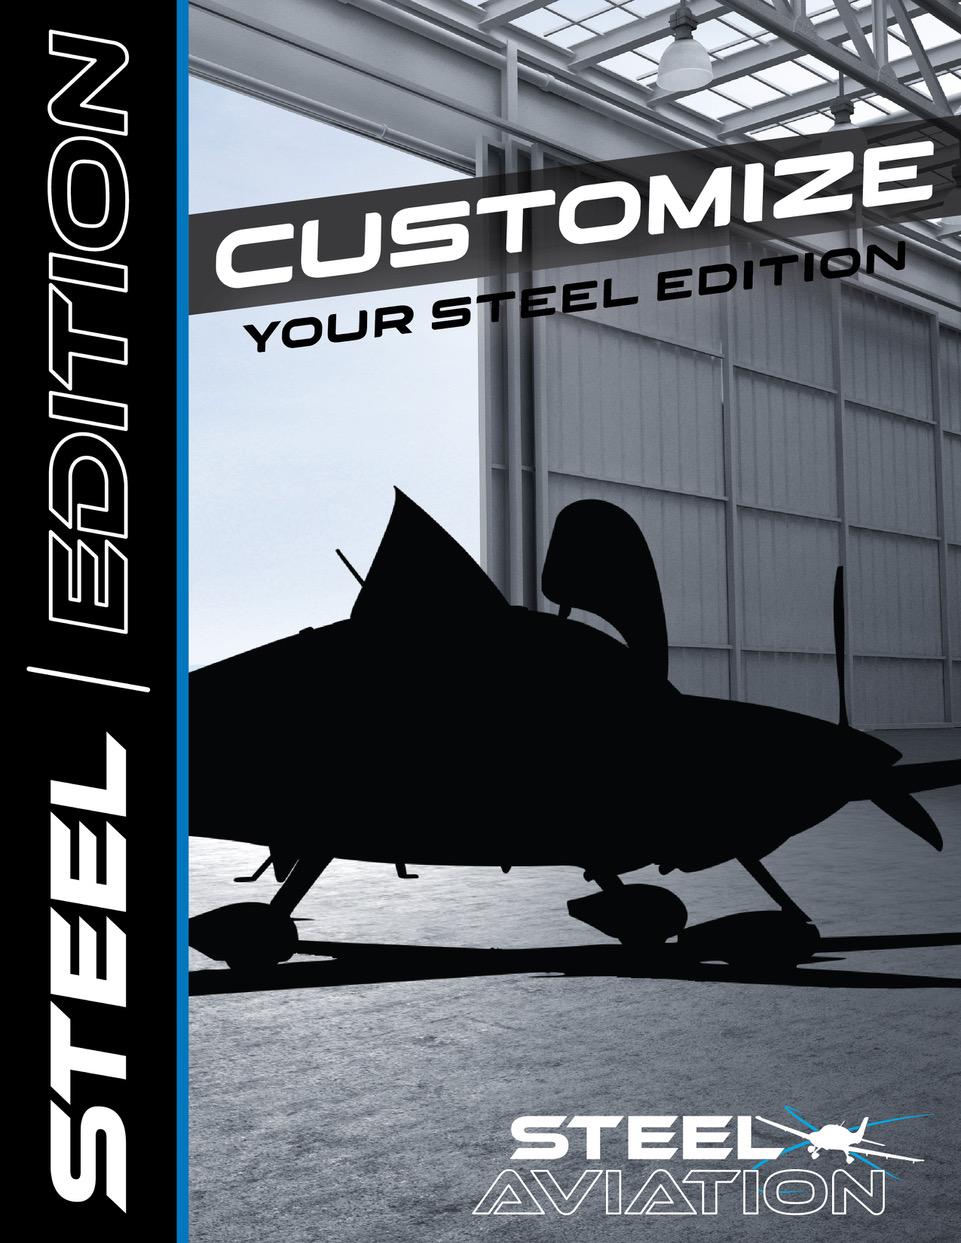 Custom Steel Edition